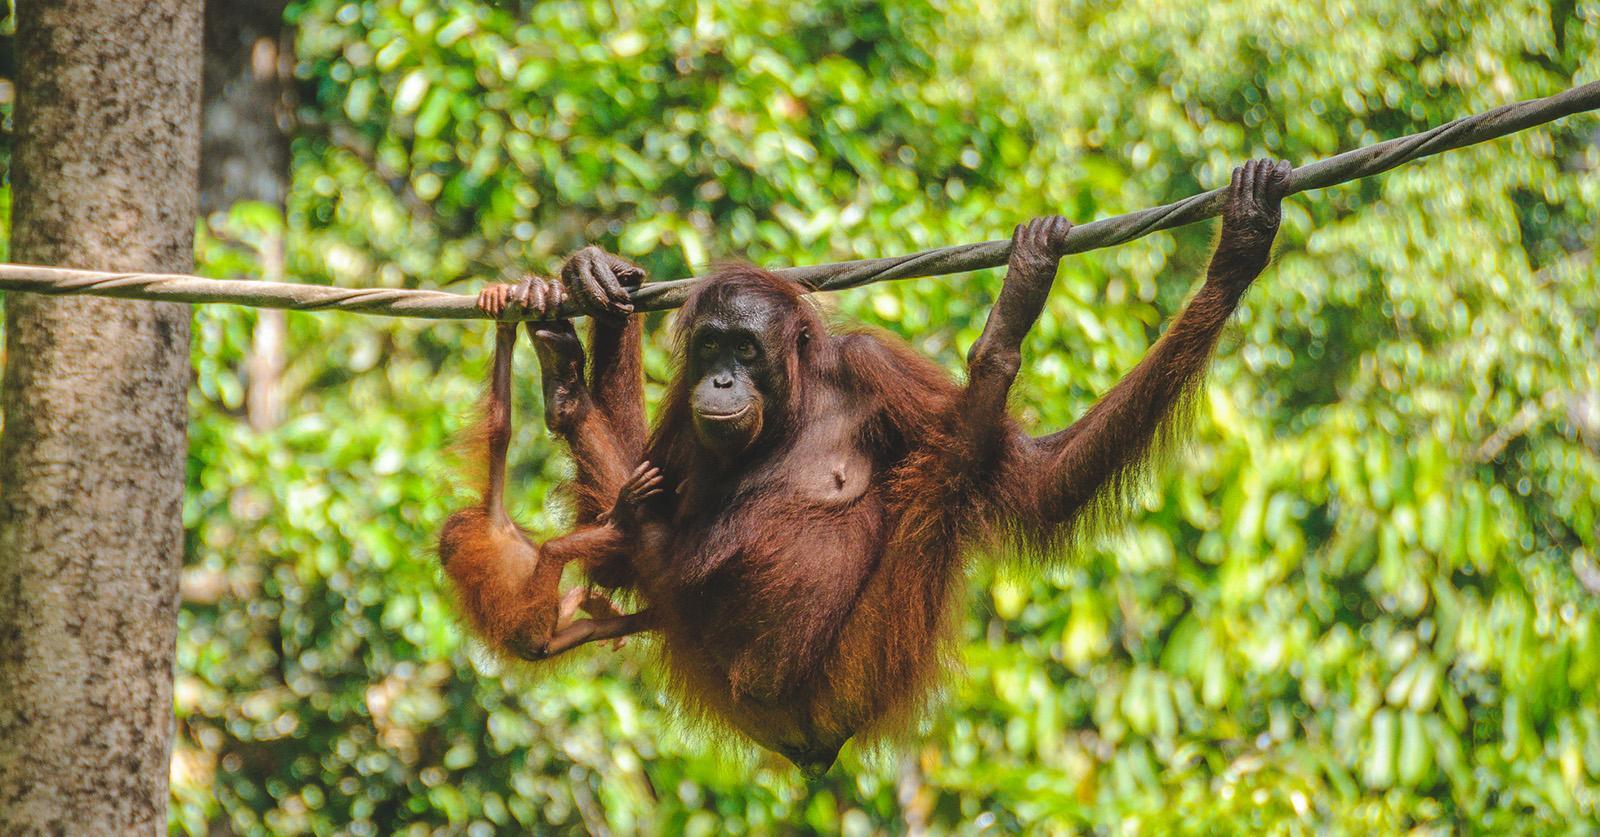 Orangutans4-1536088571830-1536088574294.jpg